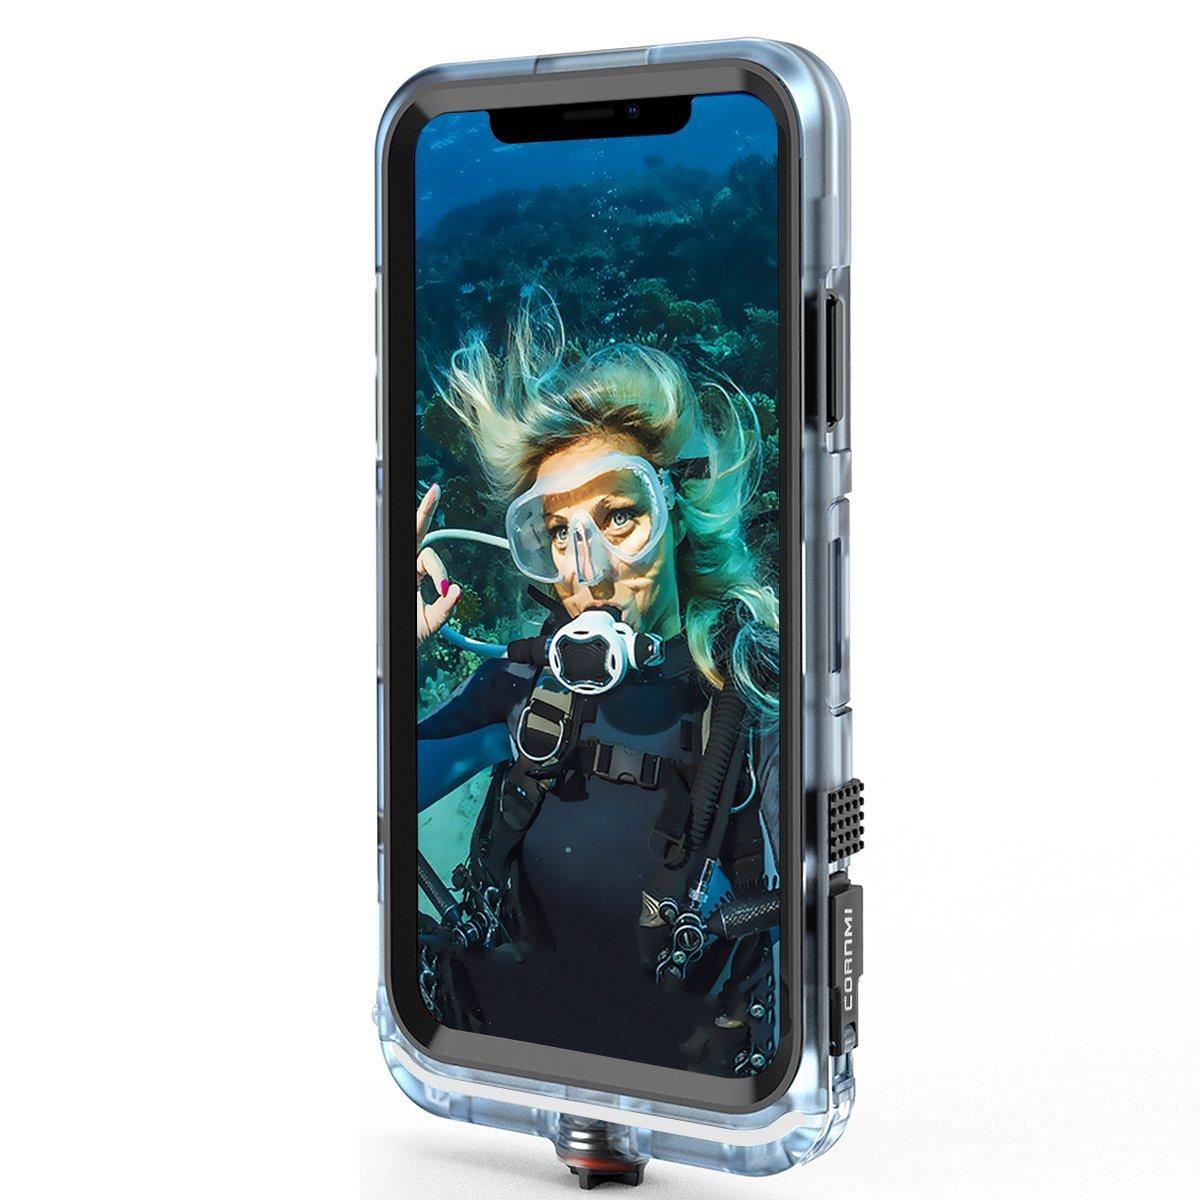 Cornmi iPhone X Waterproof Case, Full Sealed IP68 Certified Waterproof Shockproof Snowproof Protection Underwater Case for iPhone X 5.2inch (Black) by Cornmi (Image #8)